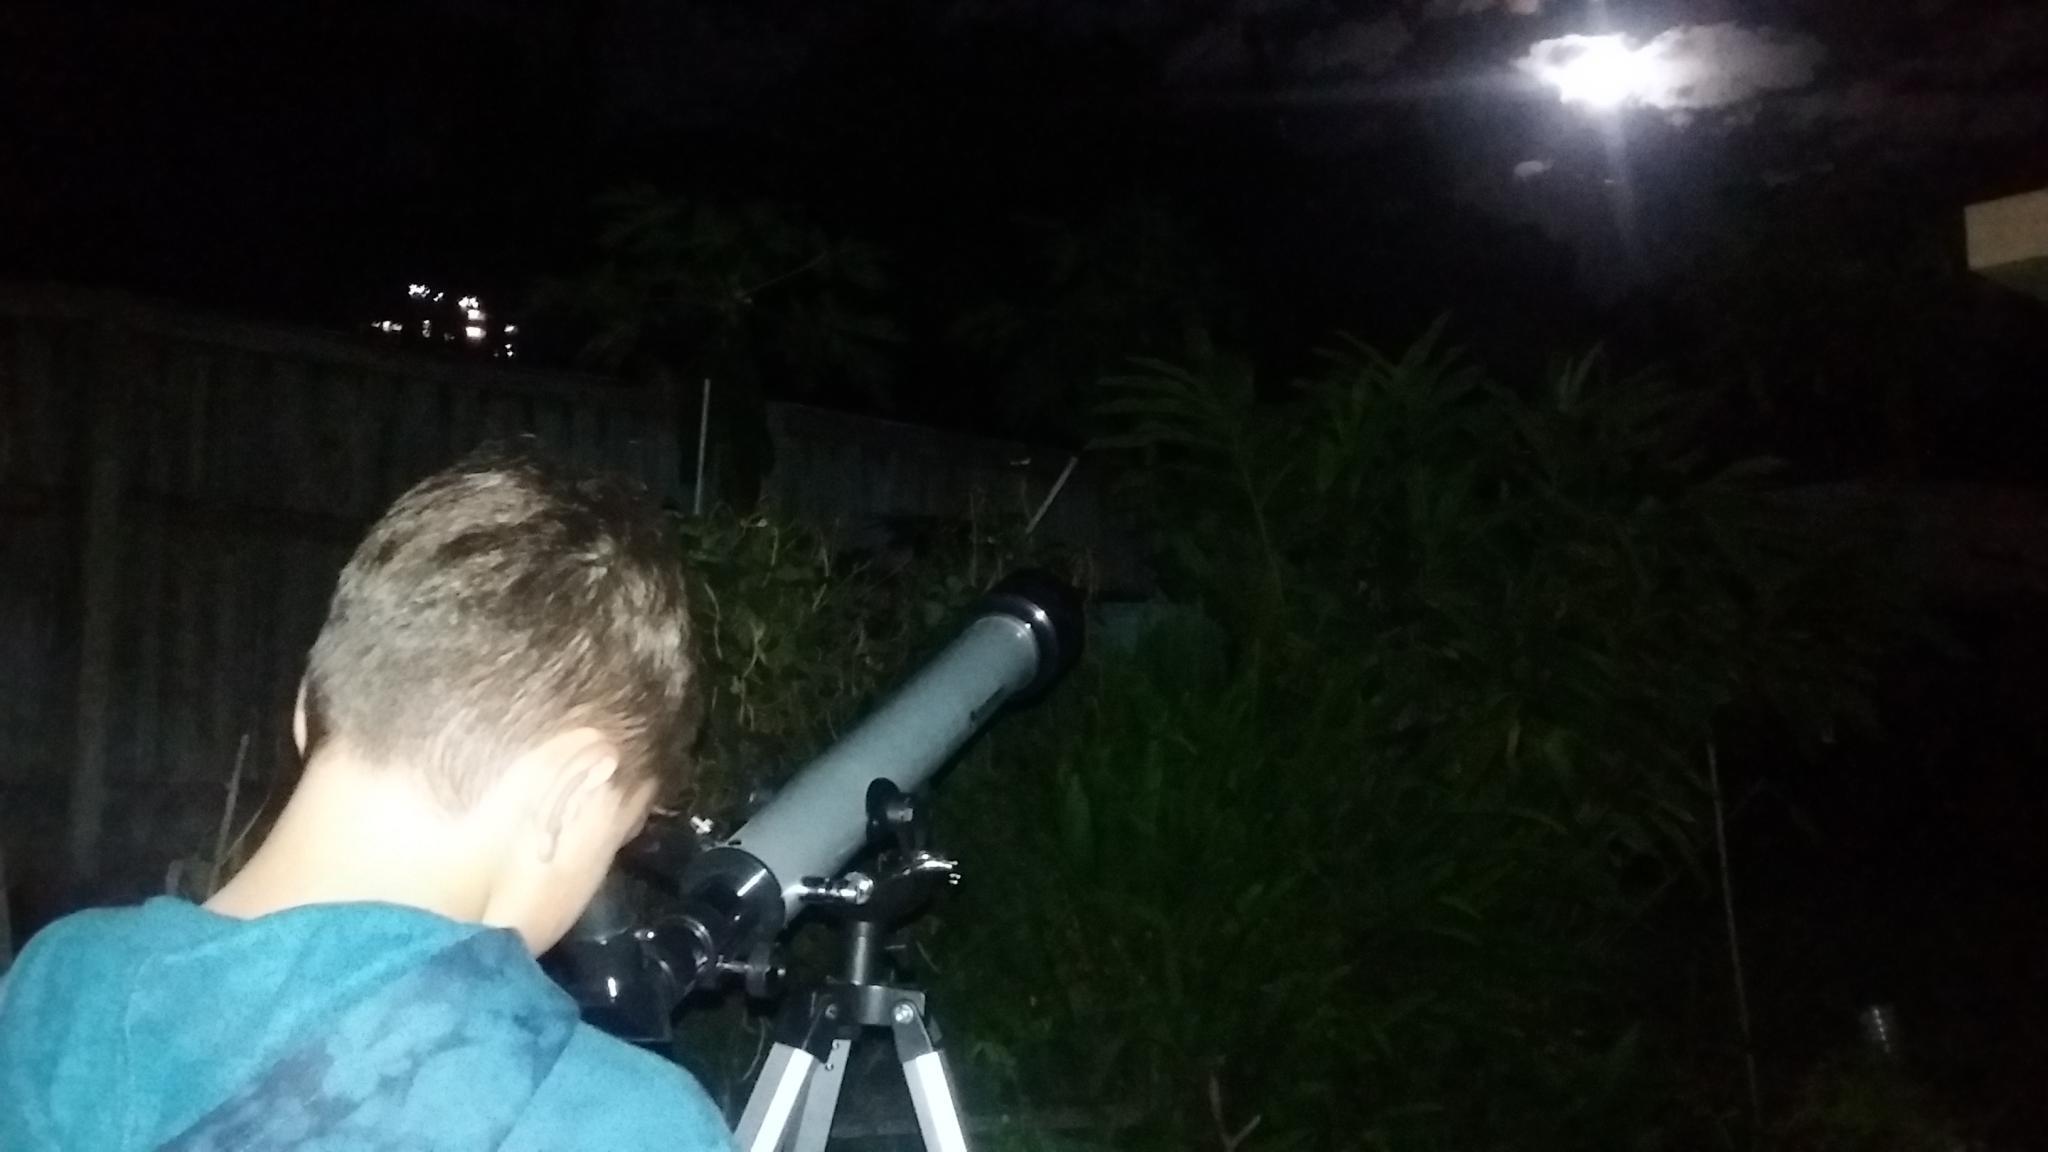 Recommend a telescope-20210526_183625-jpg